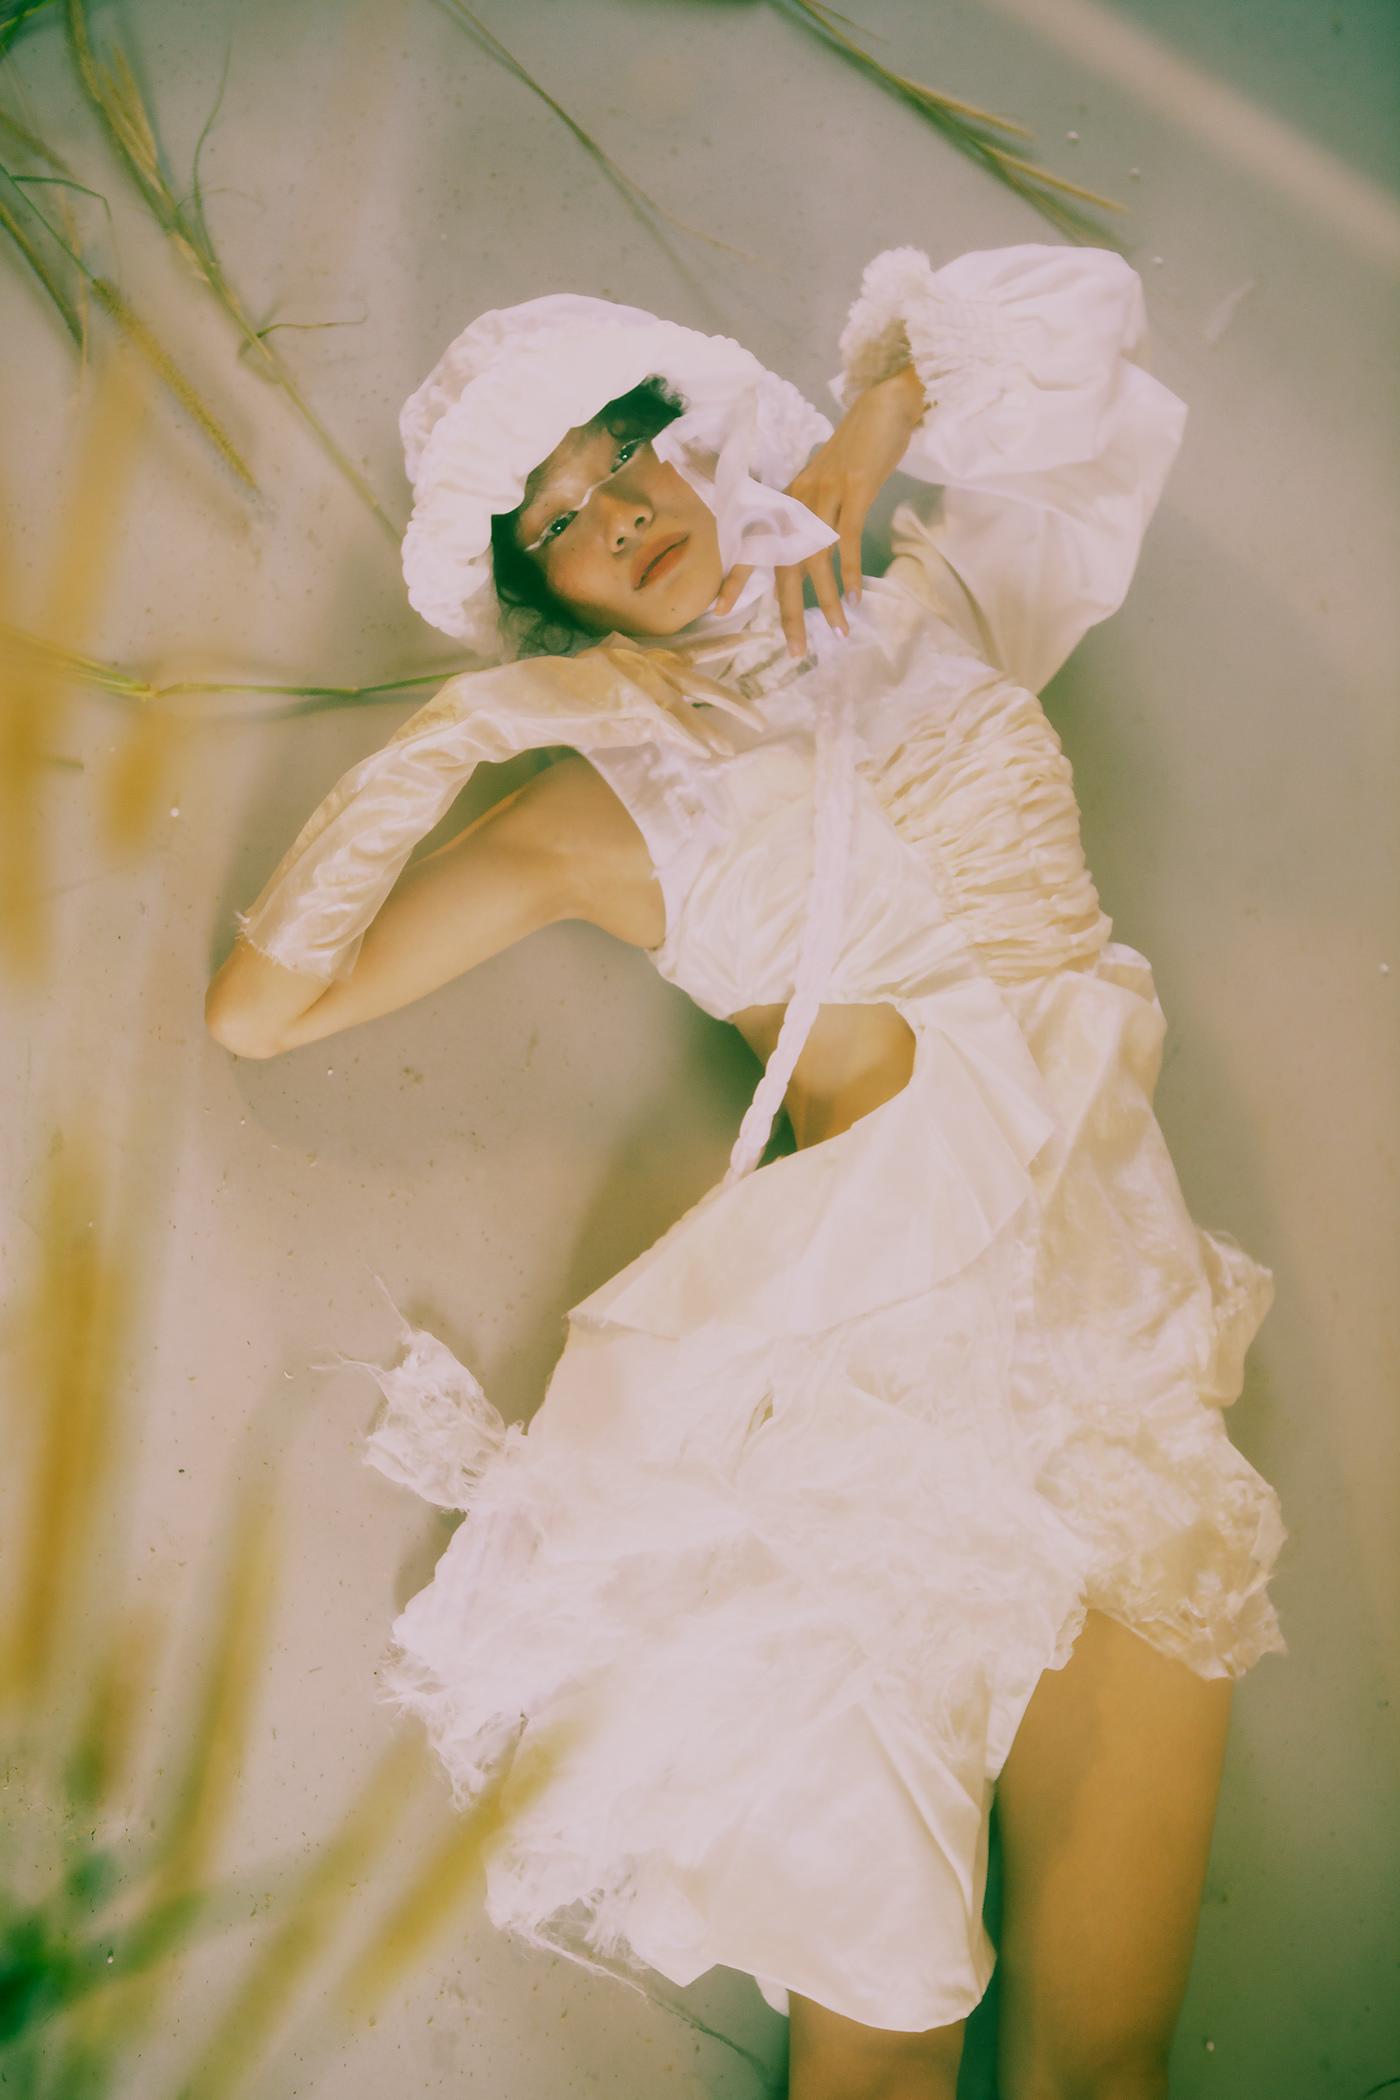 Image may contain: wedding dress and human face